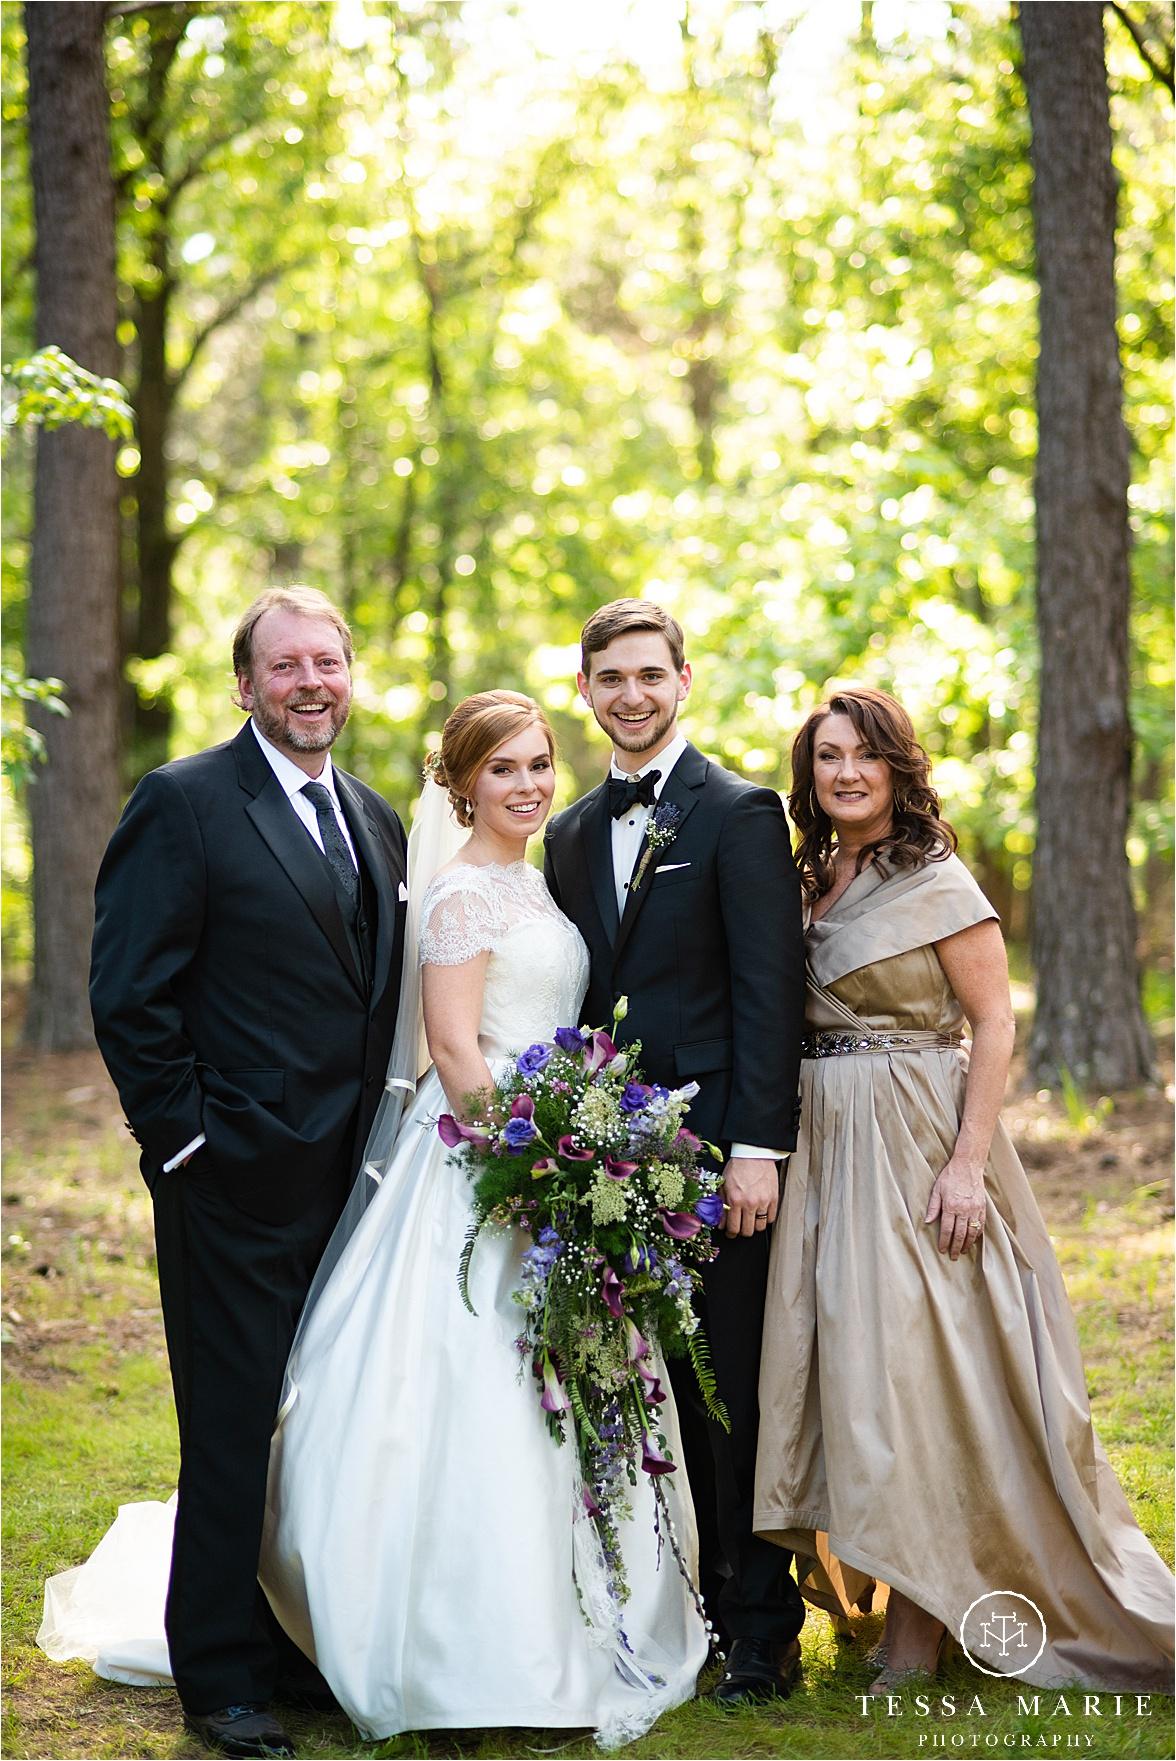 Tessa_marie_weddings_columbus_wedding_photographer_wedding_day_spring_outdoor_wedding_0101.jpg